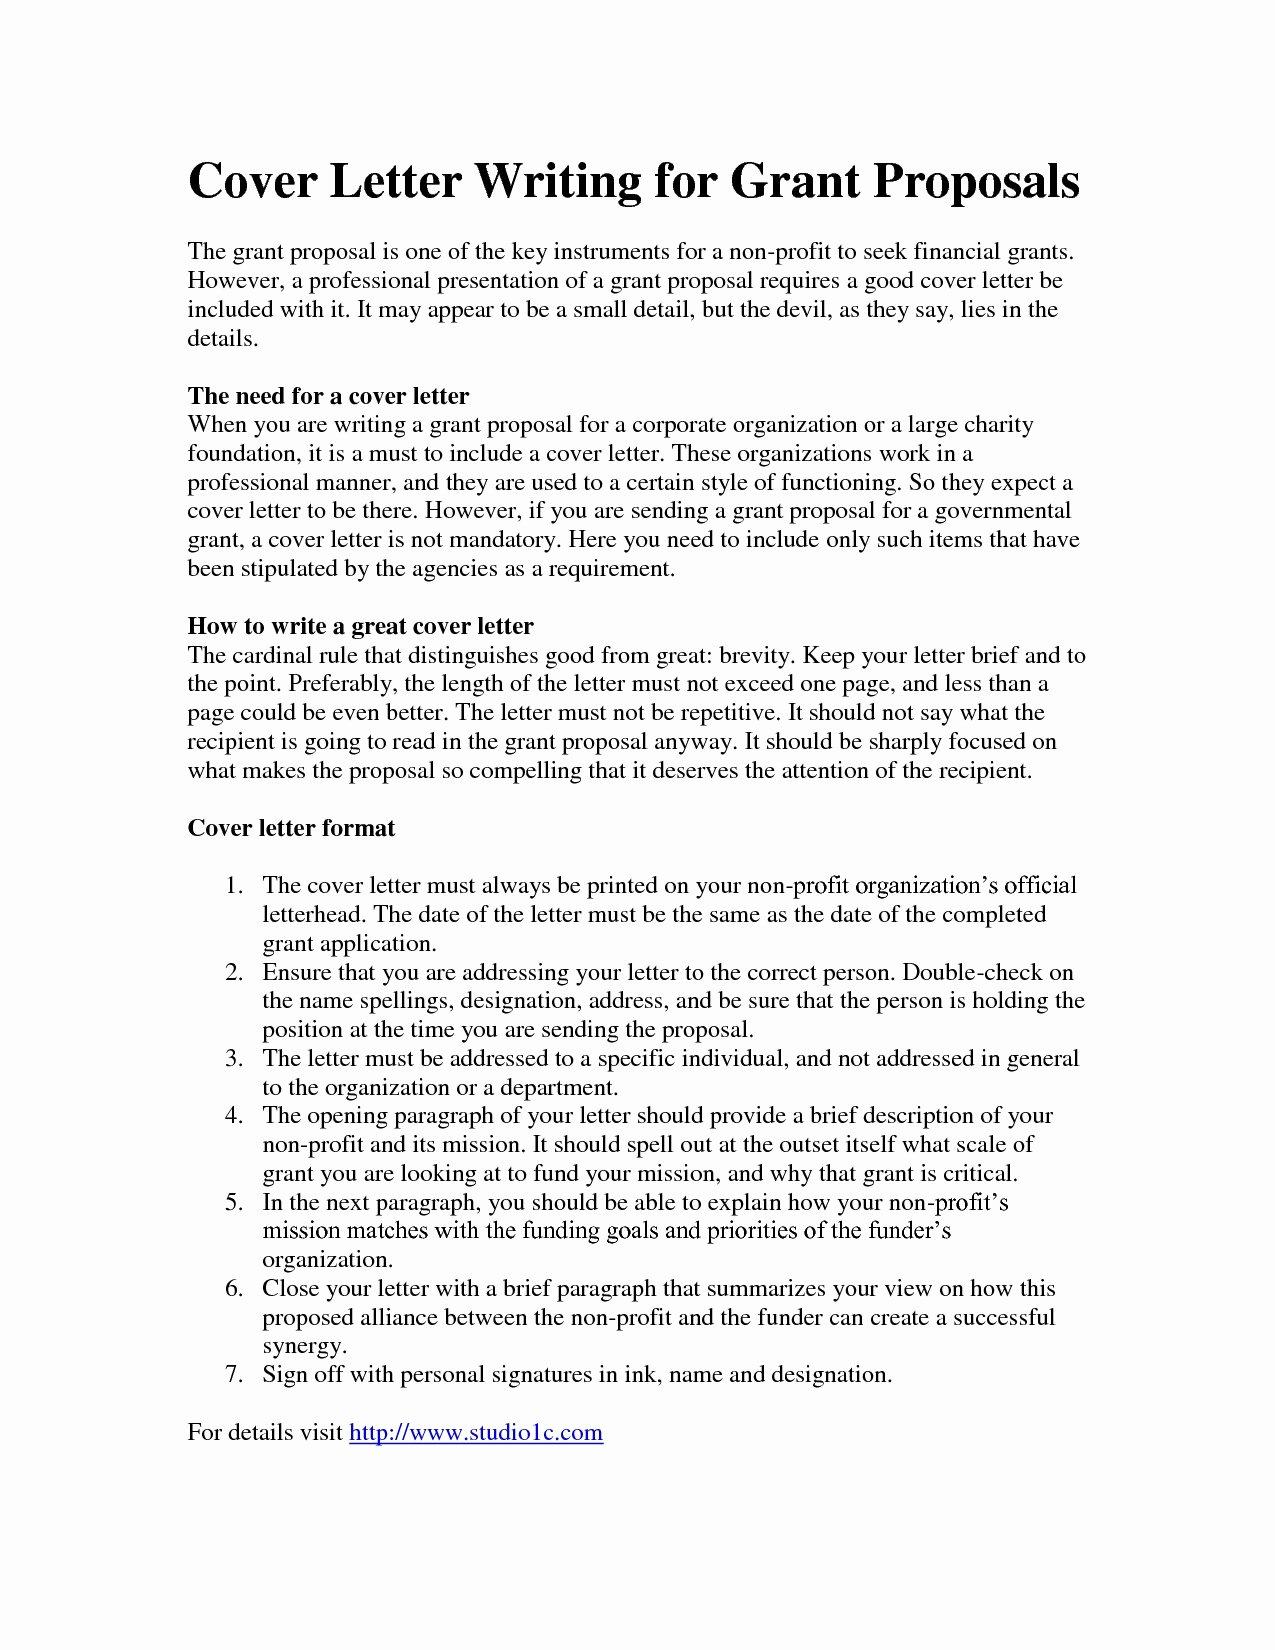 Sample Cover Letter for Grant Proposal Lovely 35 Fast Sample Business Proposal Letter for Funding